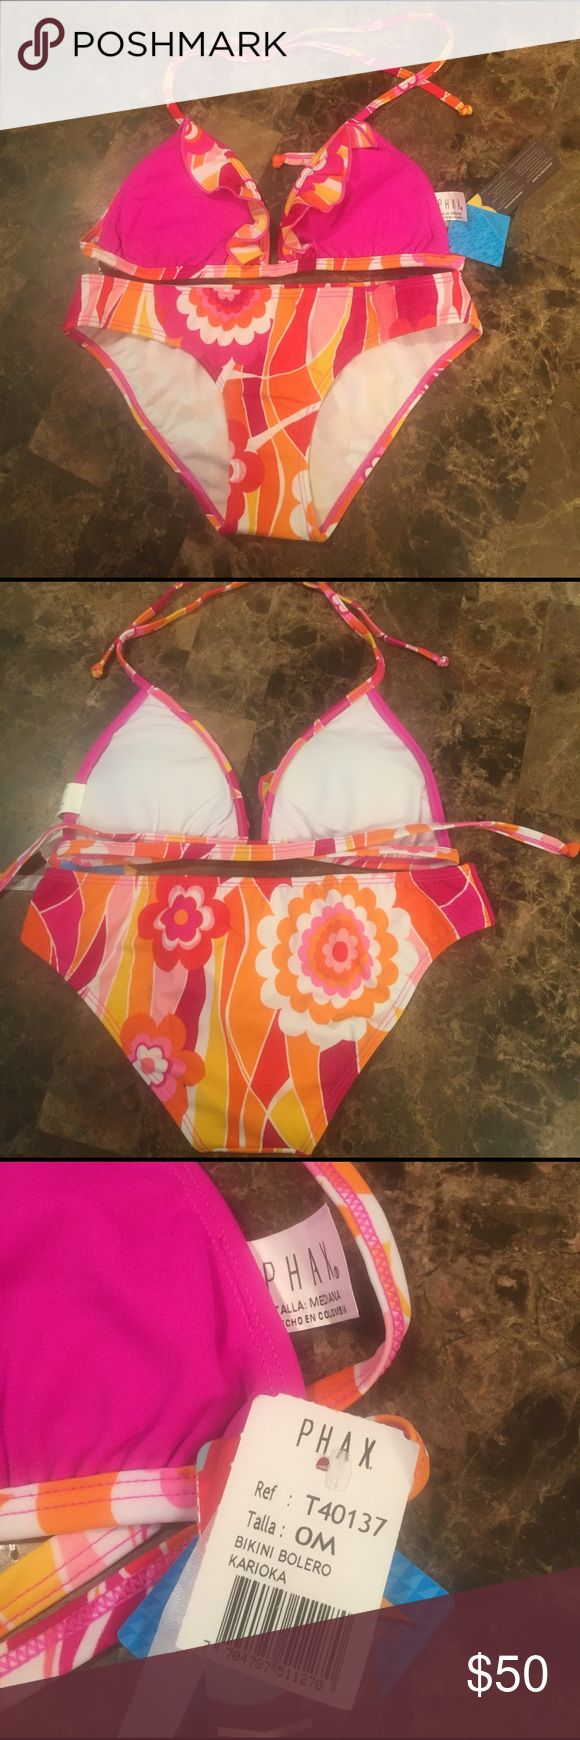 Fru Fru Pink/Orange 2 piece Phax bikini Fru Fru Pink/Orange 2 piece Phax bikini,famous colombian brand! Enhance your figure with molded foam cups on the top & a sexy moderate rear coverage ! PHAX Swim Bikinis